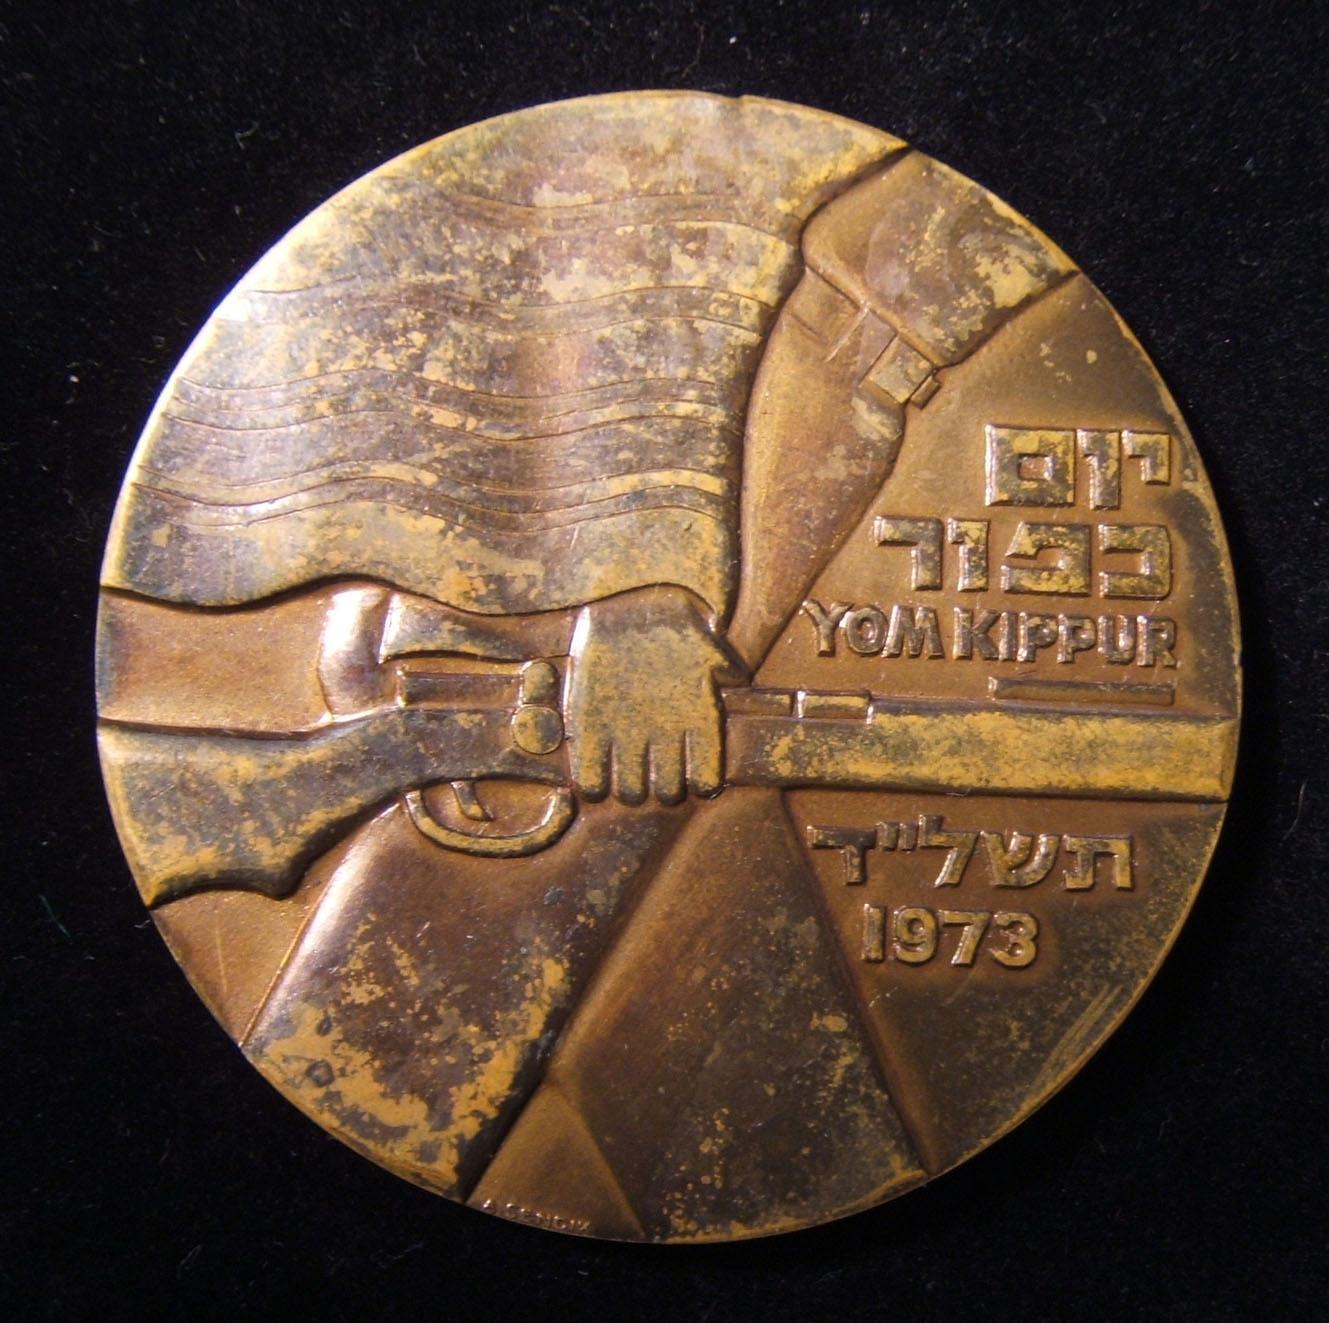 Yom Kippur US gratitude medal, 1973; numbered; by Shekel company